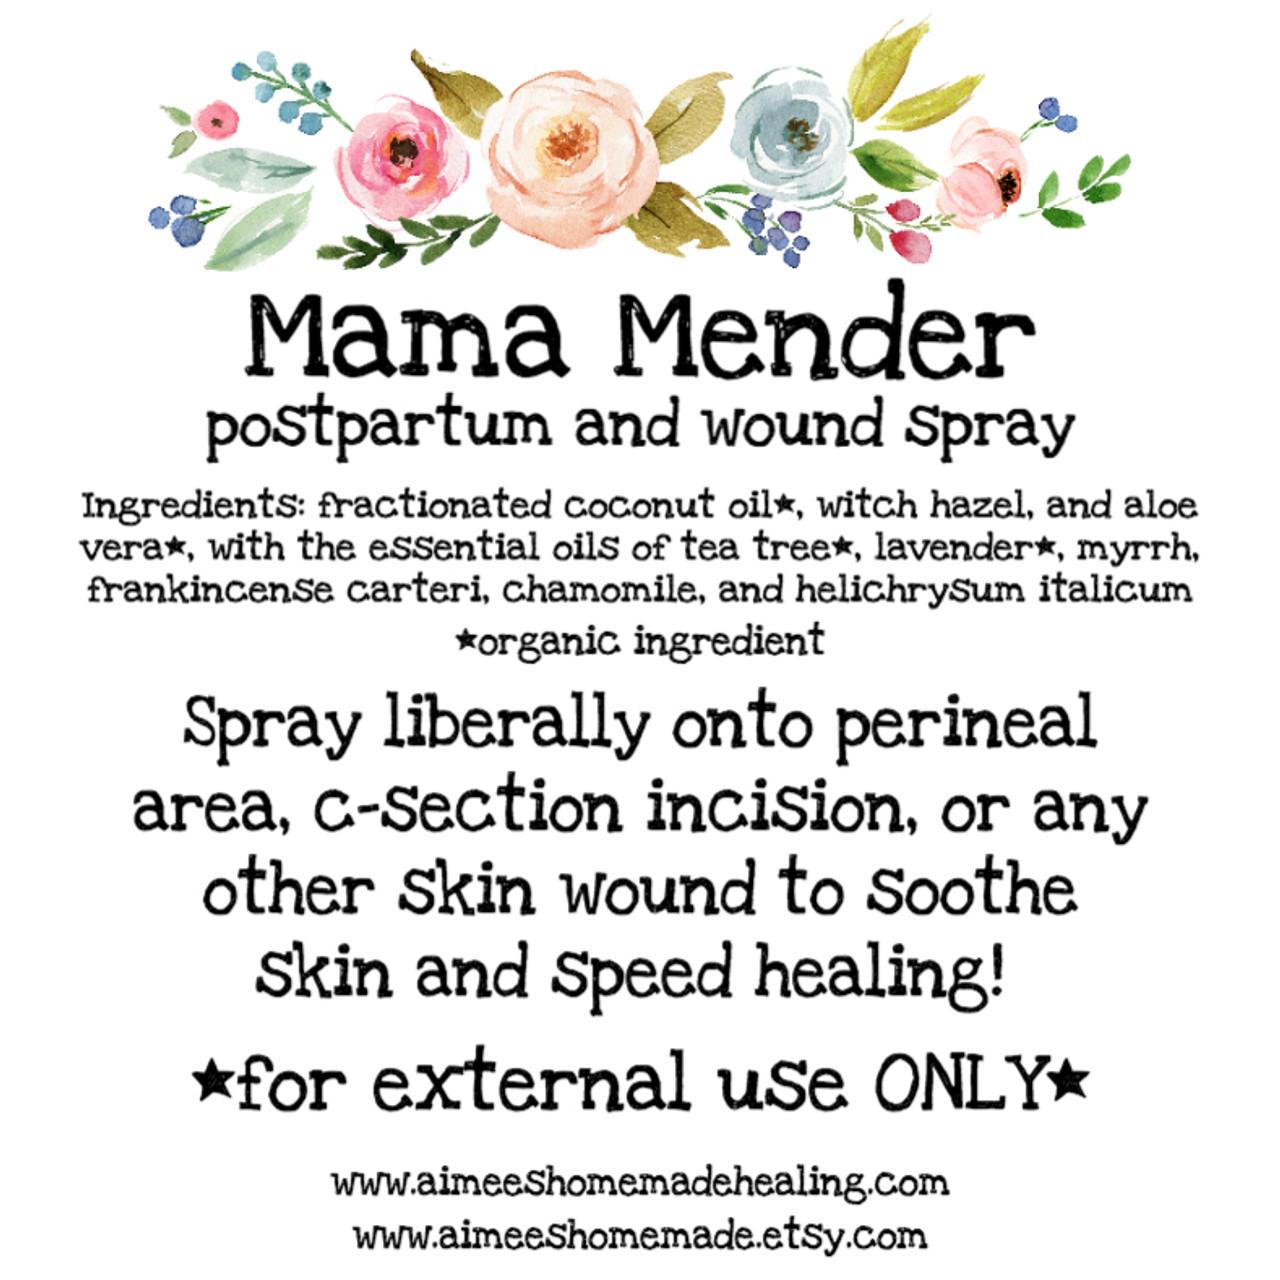 Mama Mender Spray (PostPartum and Wound Care)